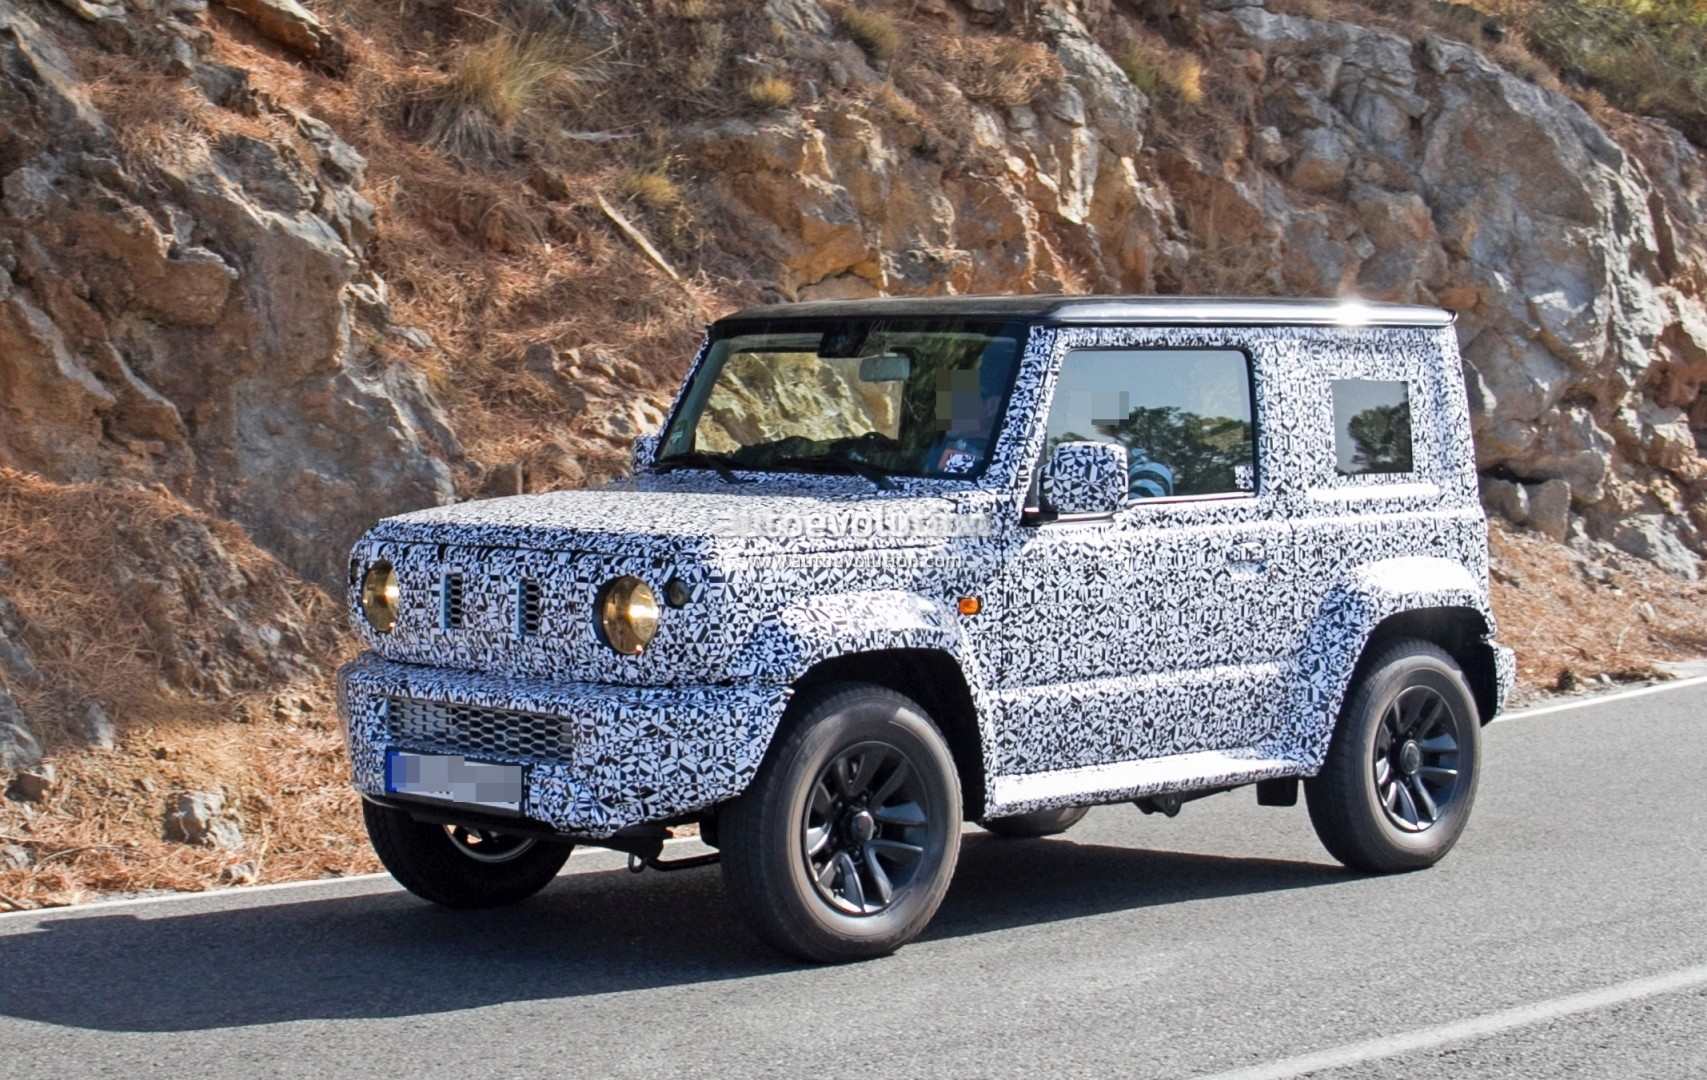 Spyshots: New Suzuki Jimny Looks Like a Tiny Mercedes-Benz G-Class